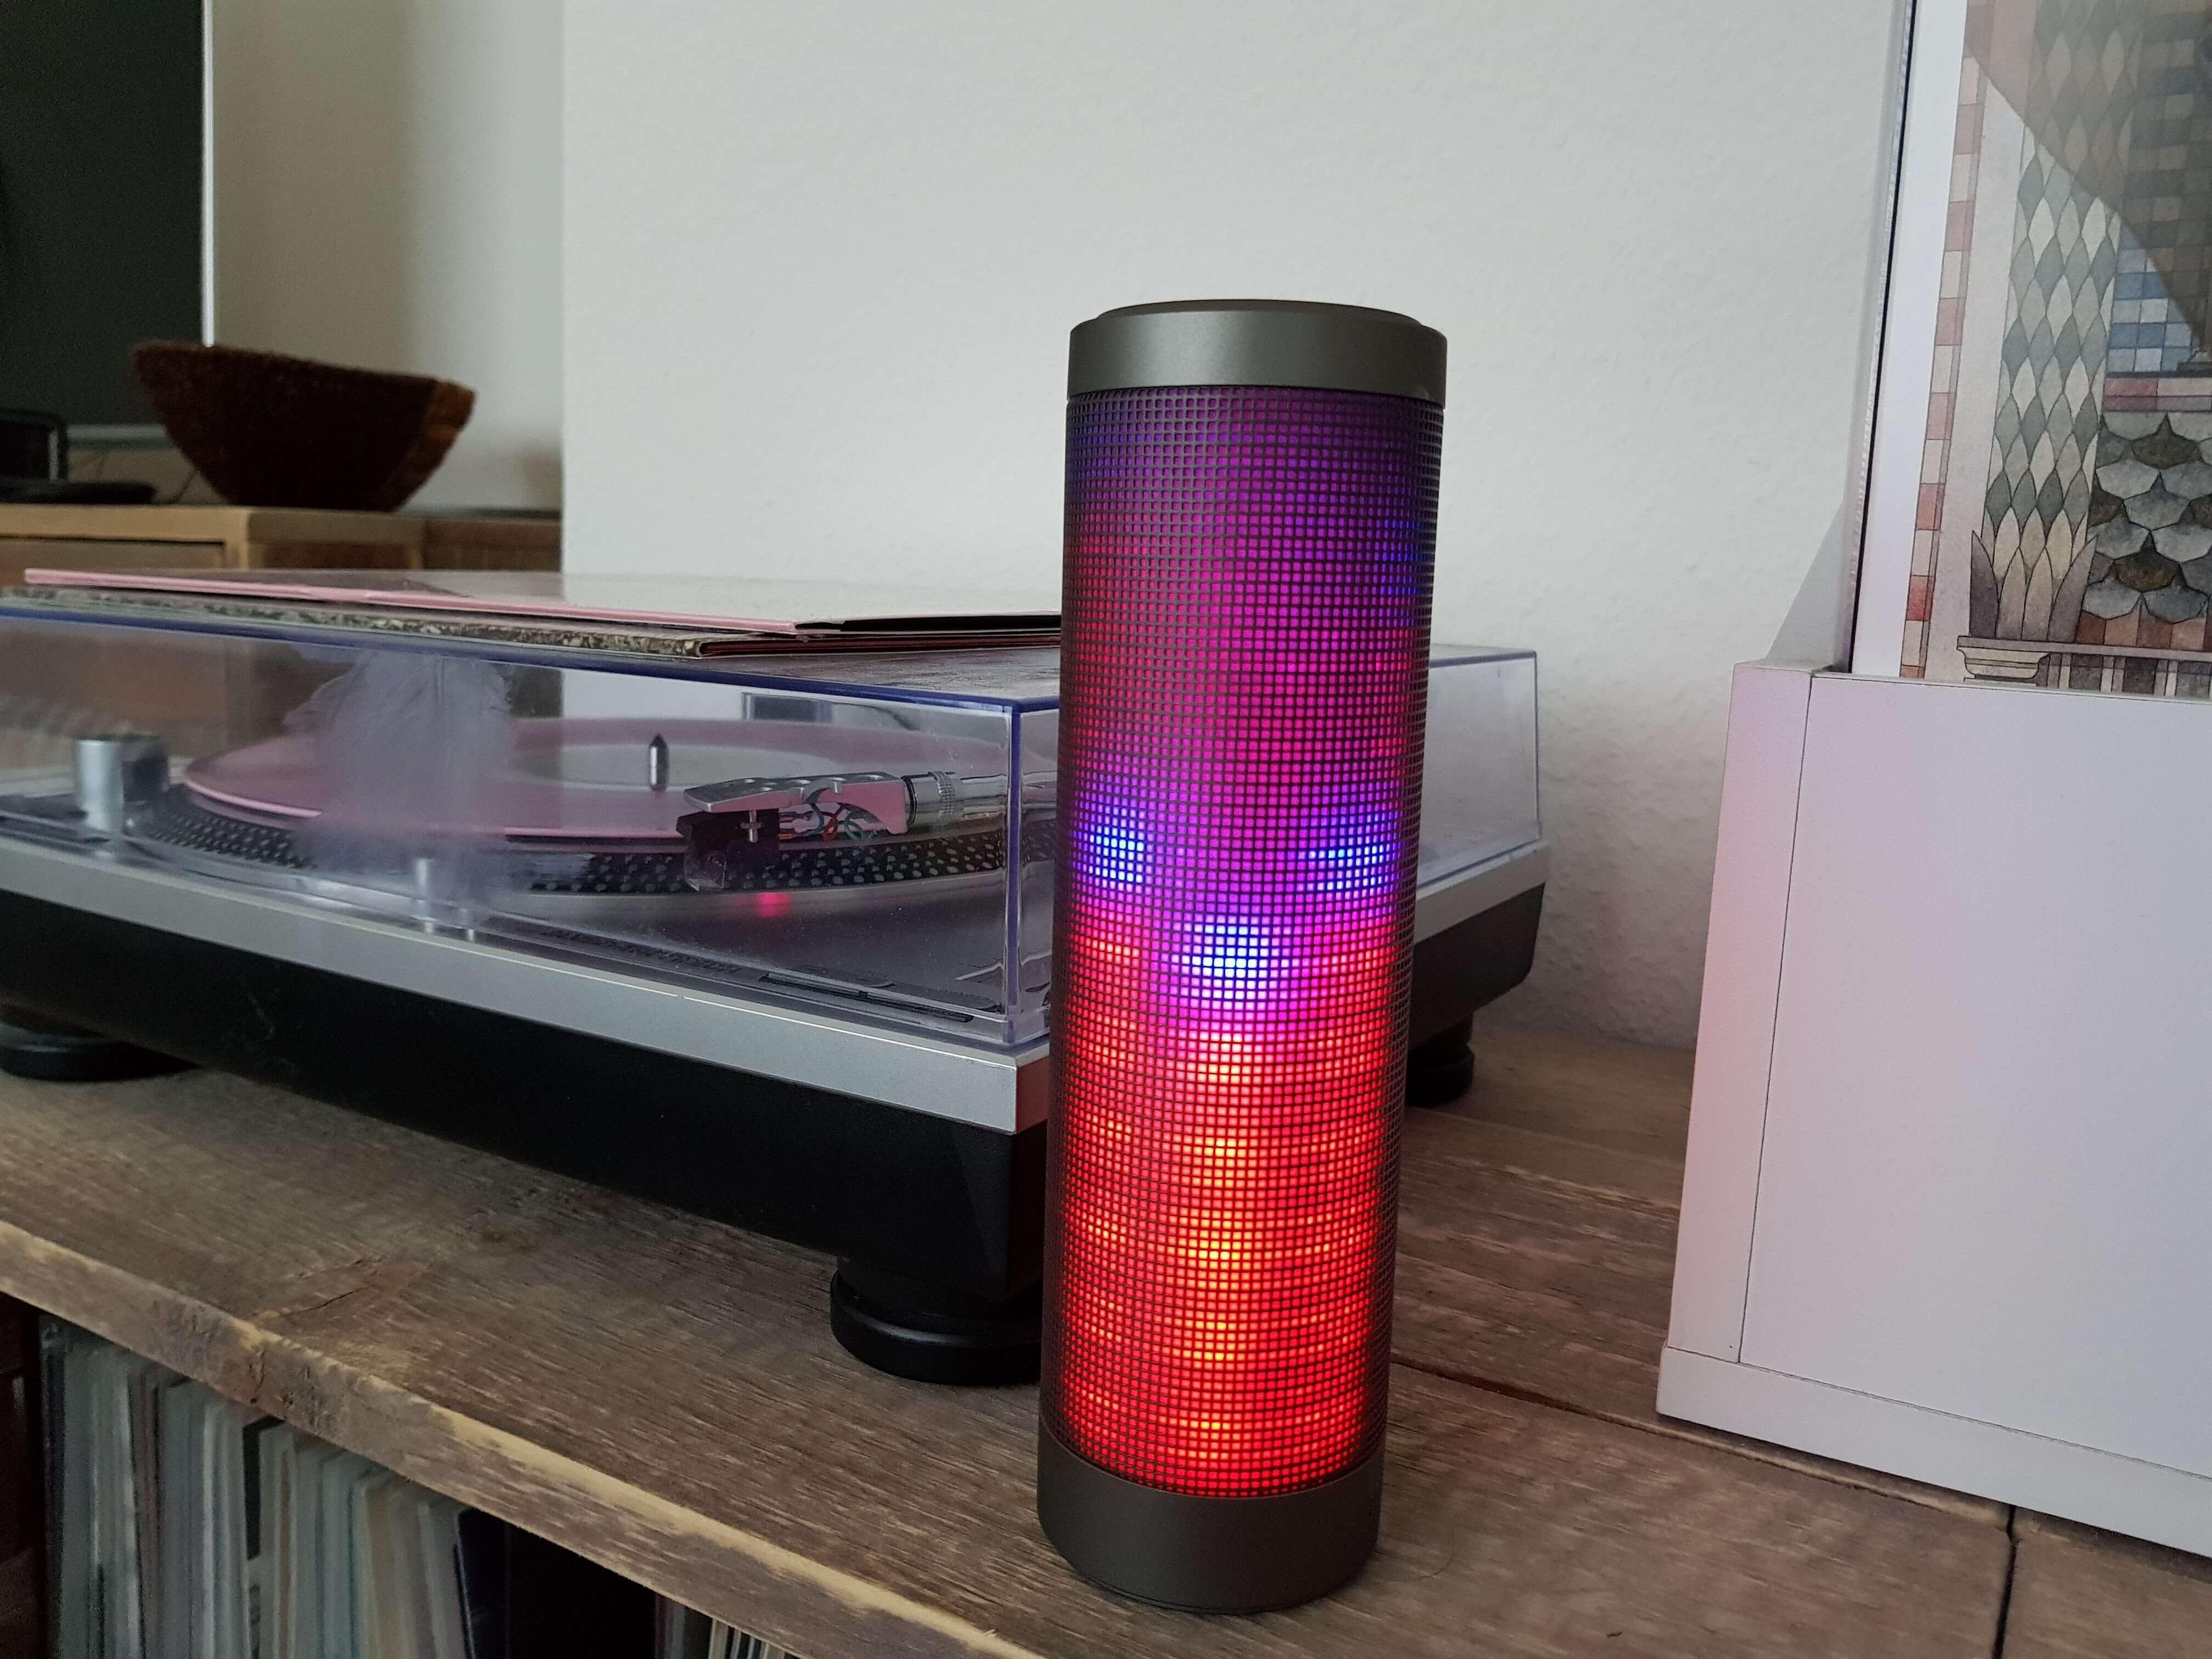 Blinkt viel, klingt gut: Bluetooth Lautsprecher Elegiant HIPHOP im Test 8